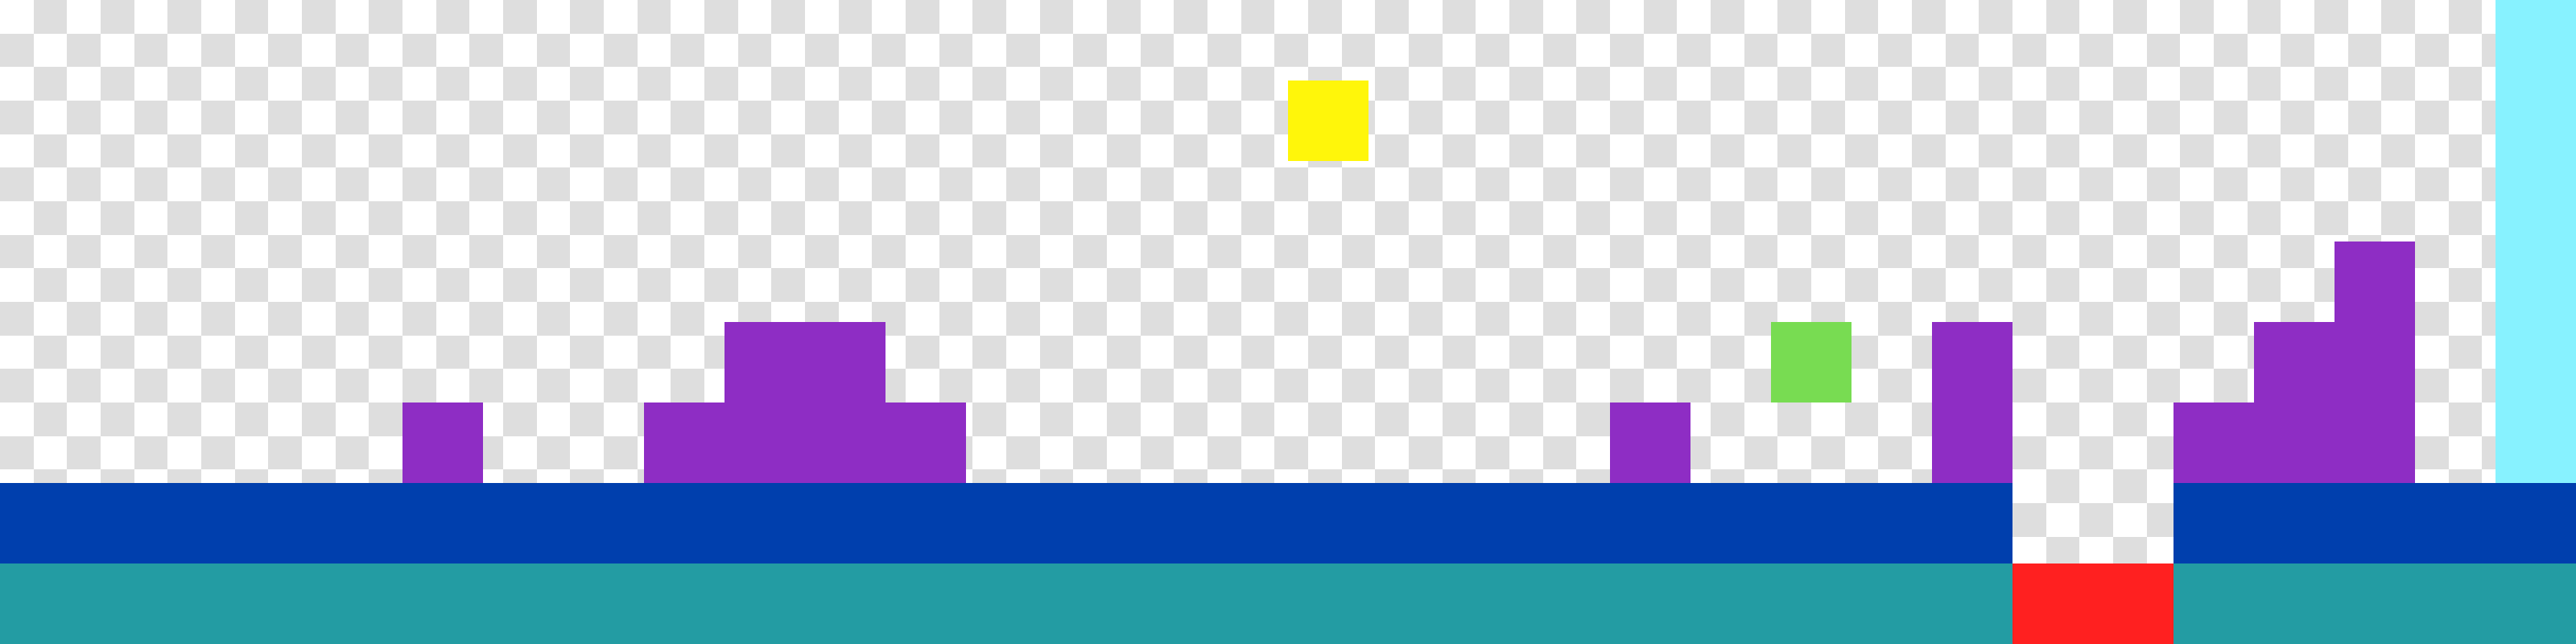 gaming_tile_map_full.png